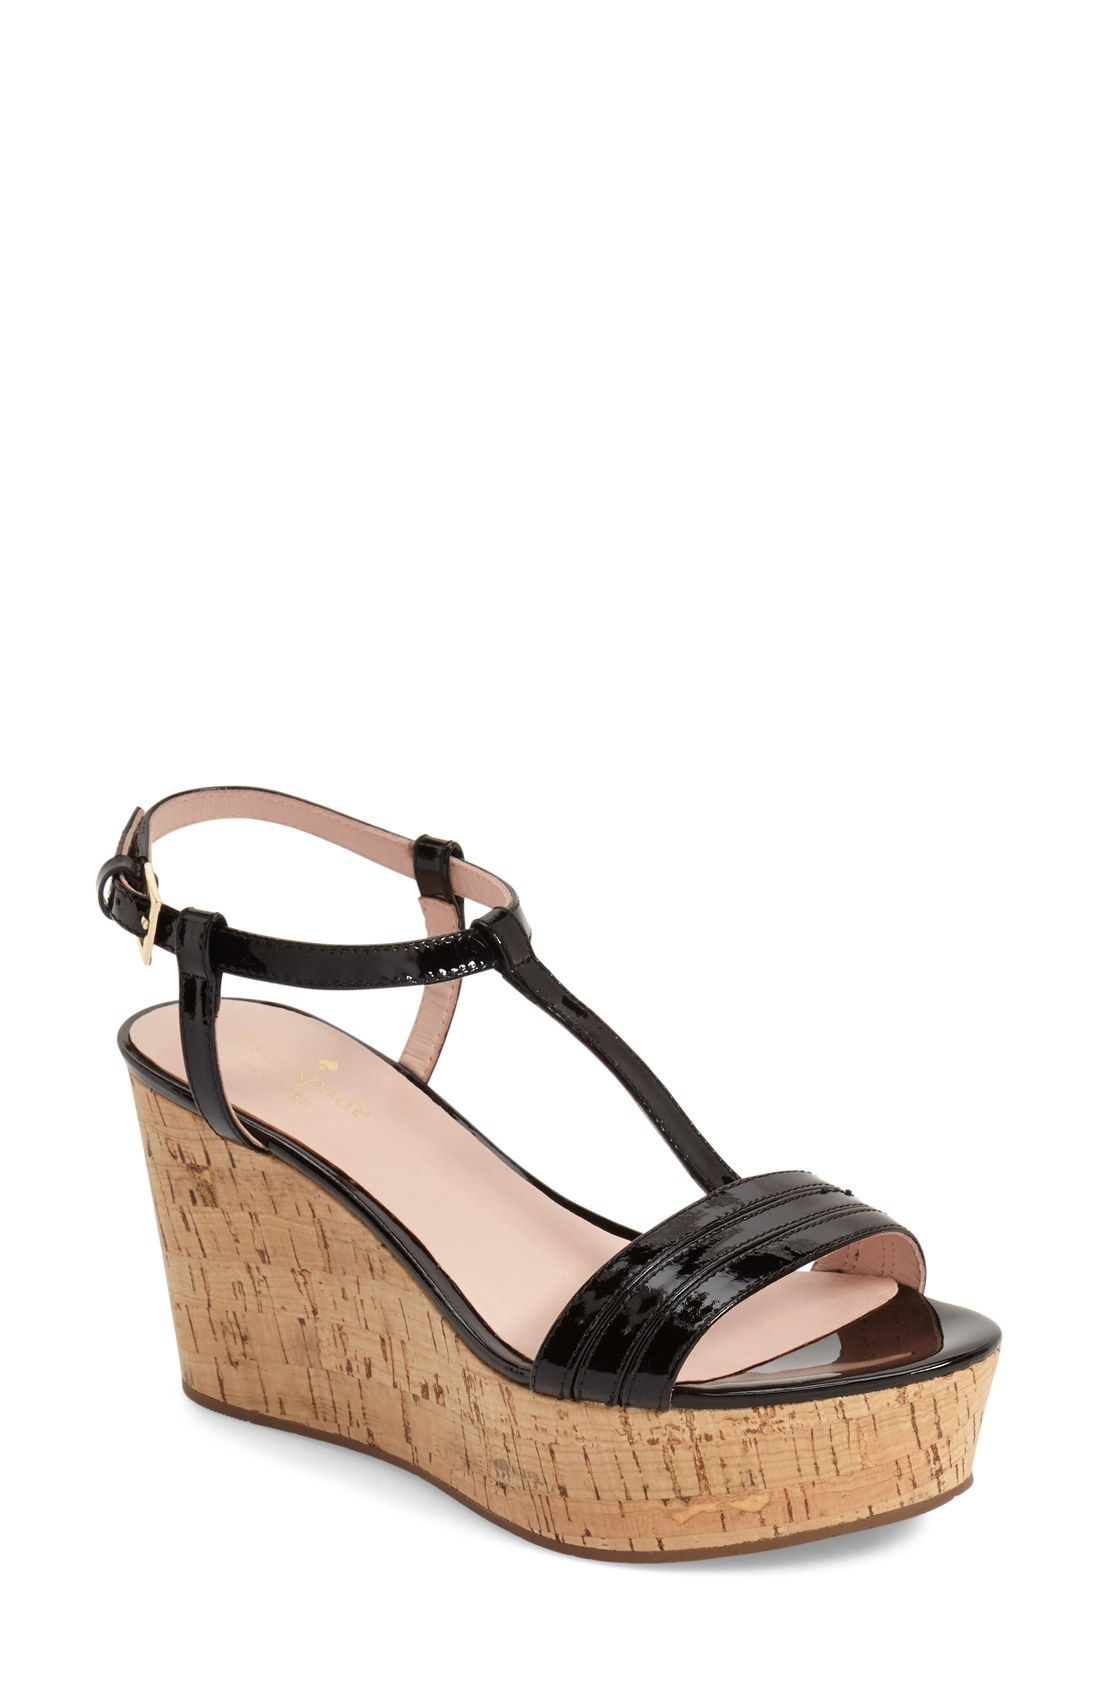 38f04930315 kate spade new york  tallin  wedge sandal (Women)